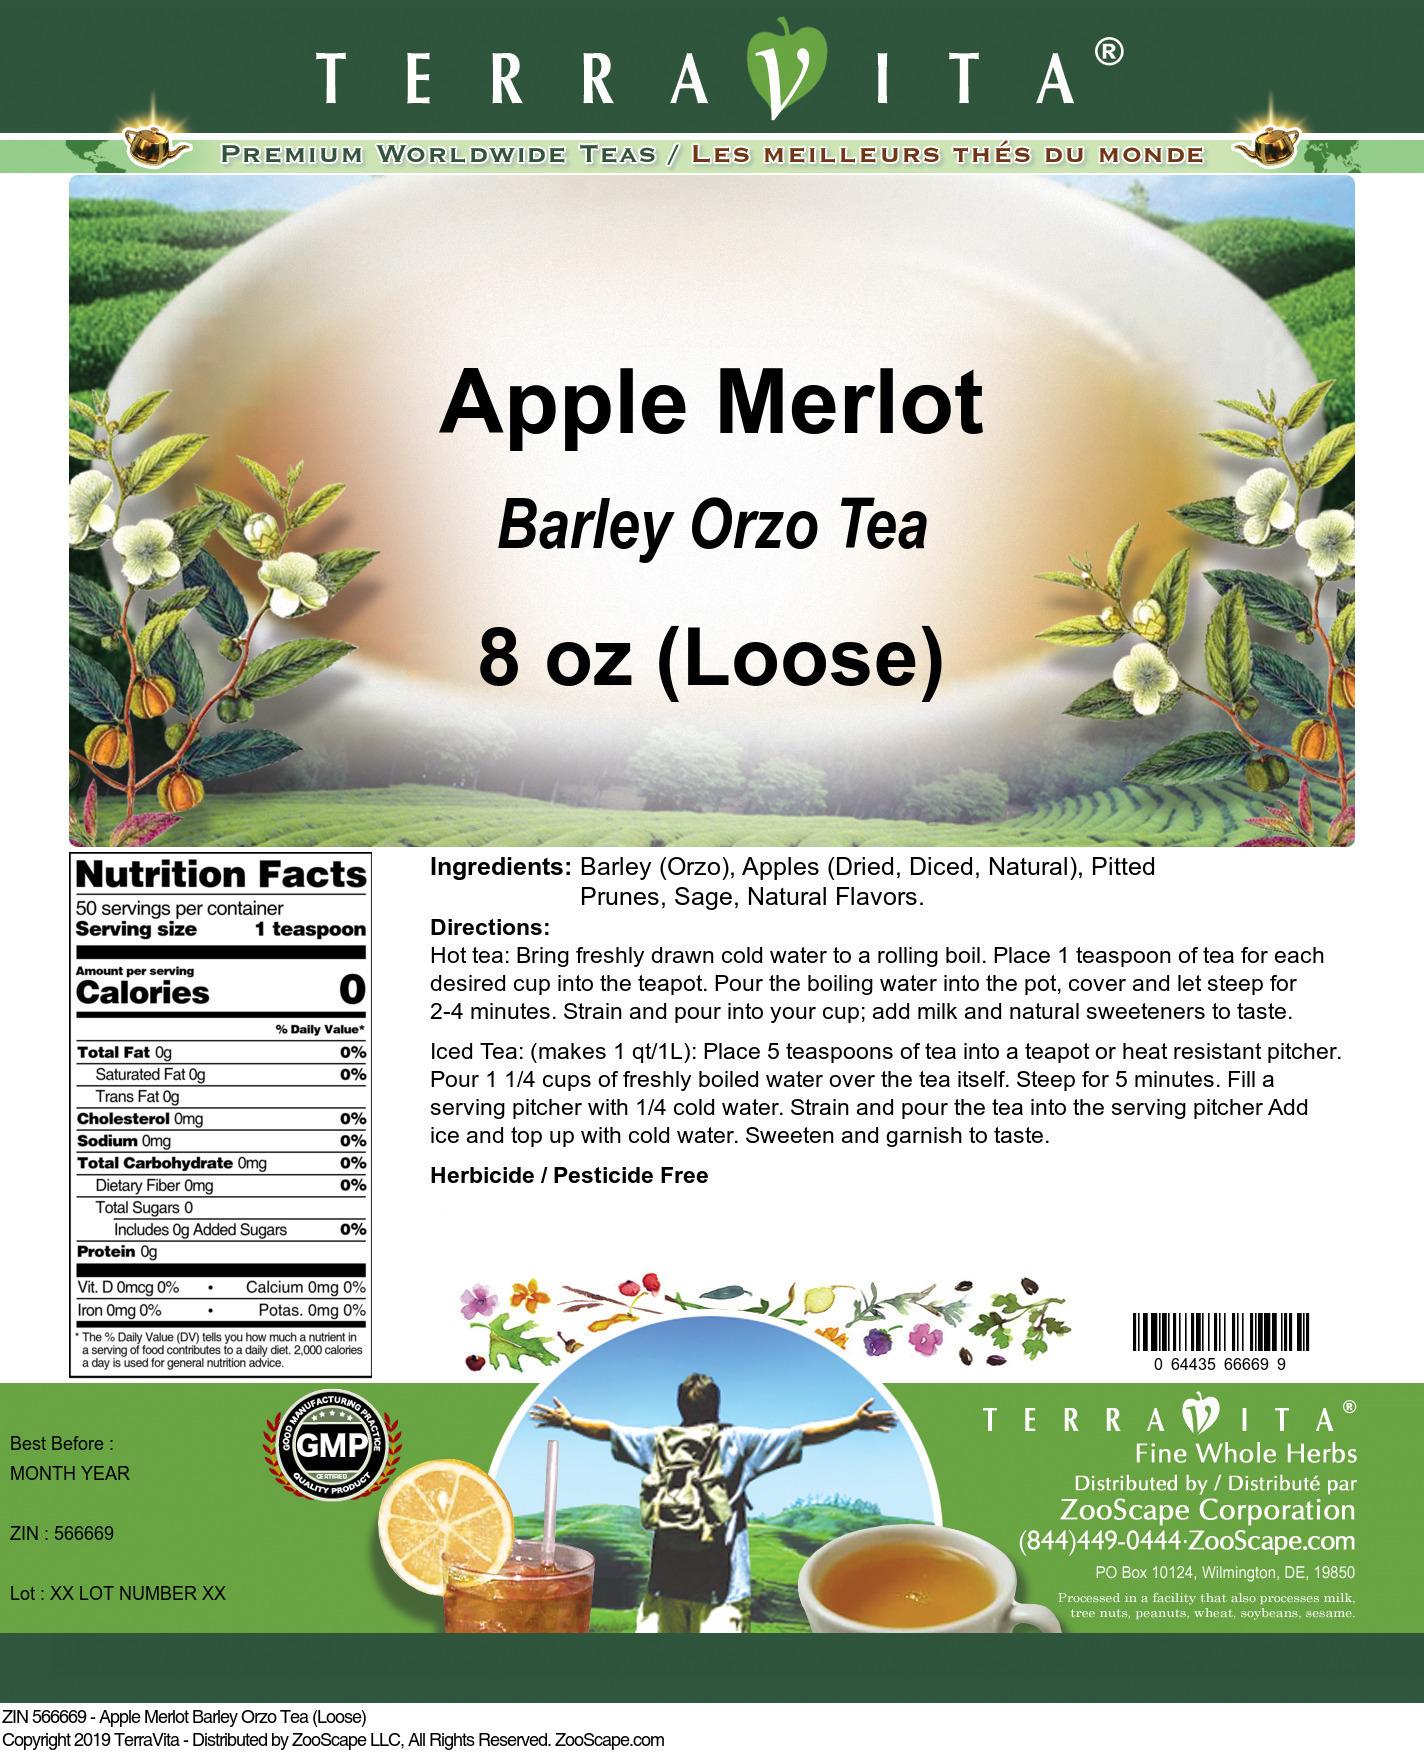 Apple Merlot Barley Orzo